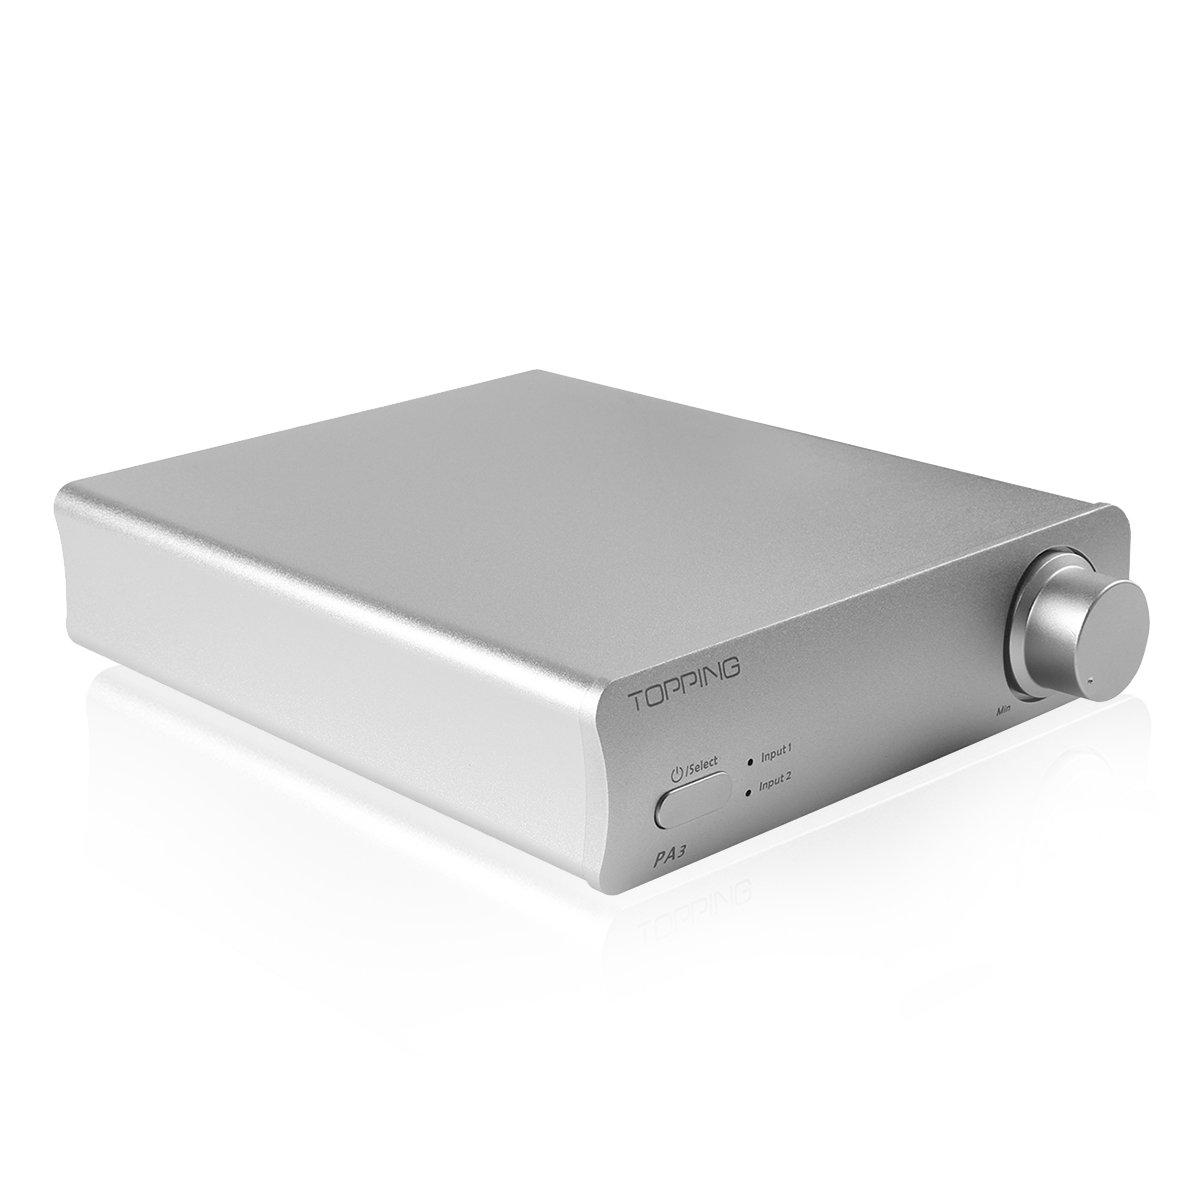 TOPPING PA3 Desktop Digital Amplifier 80W x 2(4Ω), High Power In Small Body, Silver